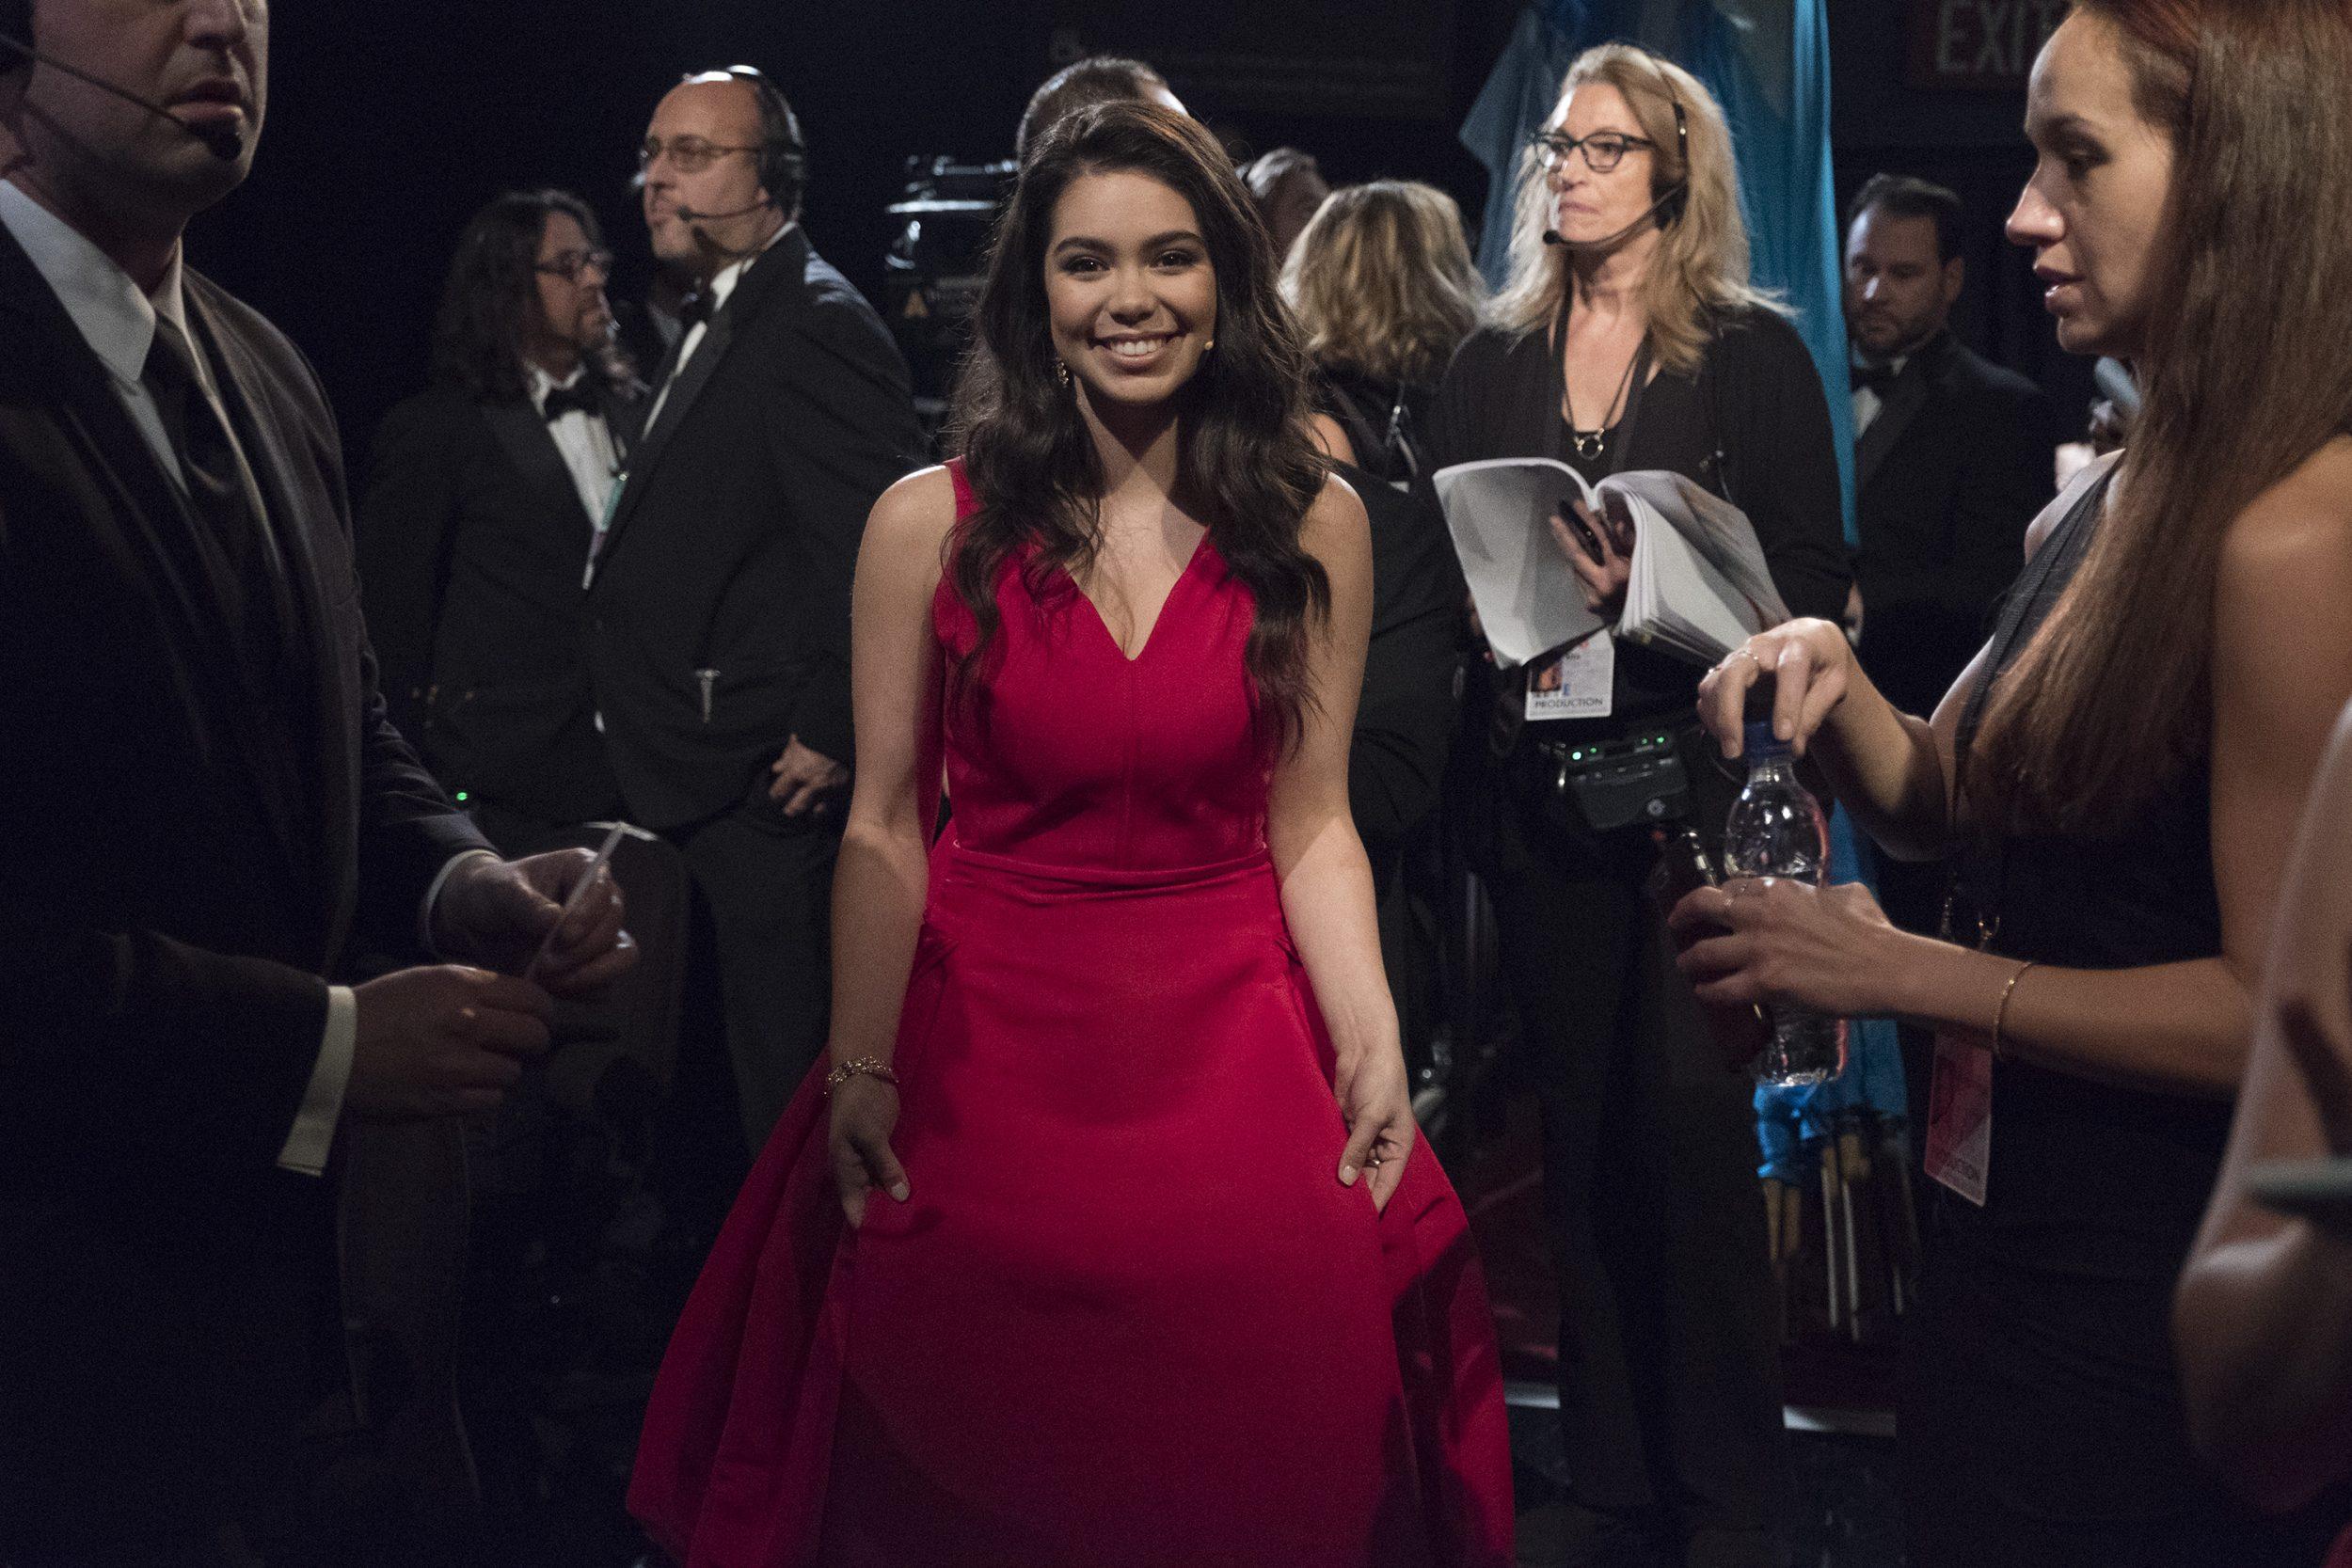 THE OSCARS(r) - The 89th Oscars(r)  broadcasts live on Oscar(r) SUNDAY, FEBRUARY 26, 2017, on the ABC Television Network. (ABC/Adam Rose) AULI'I CRAVALHO